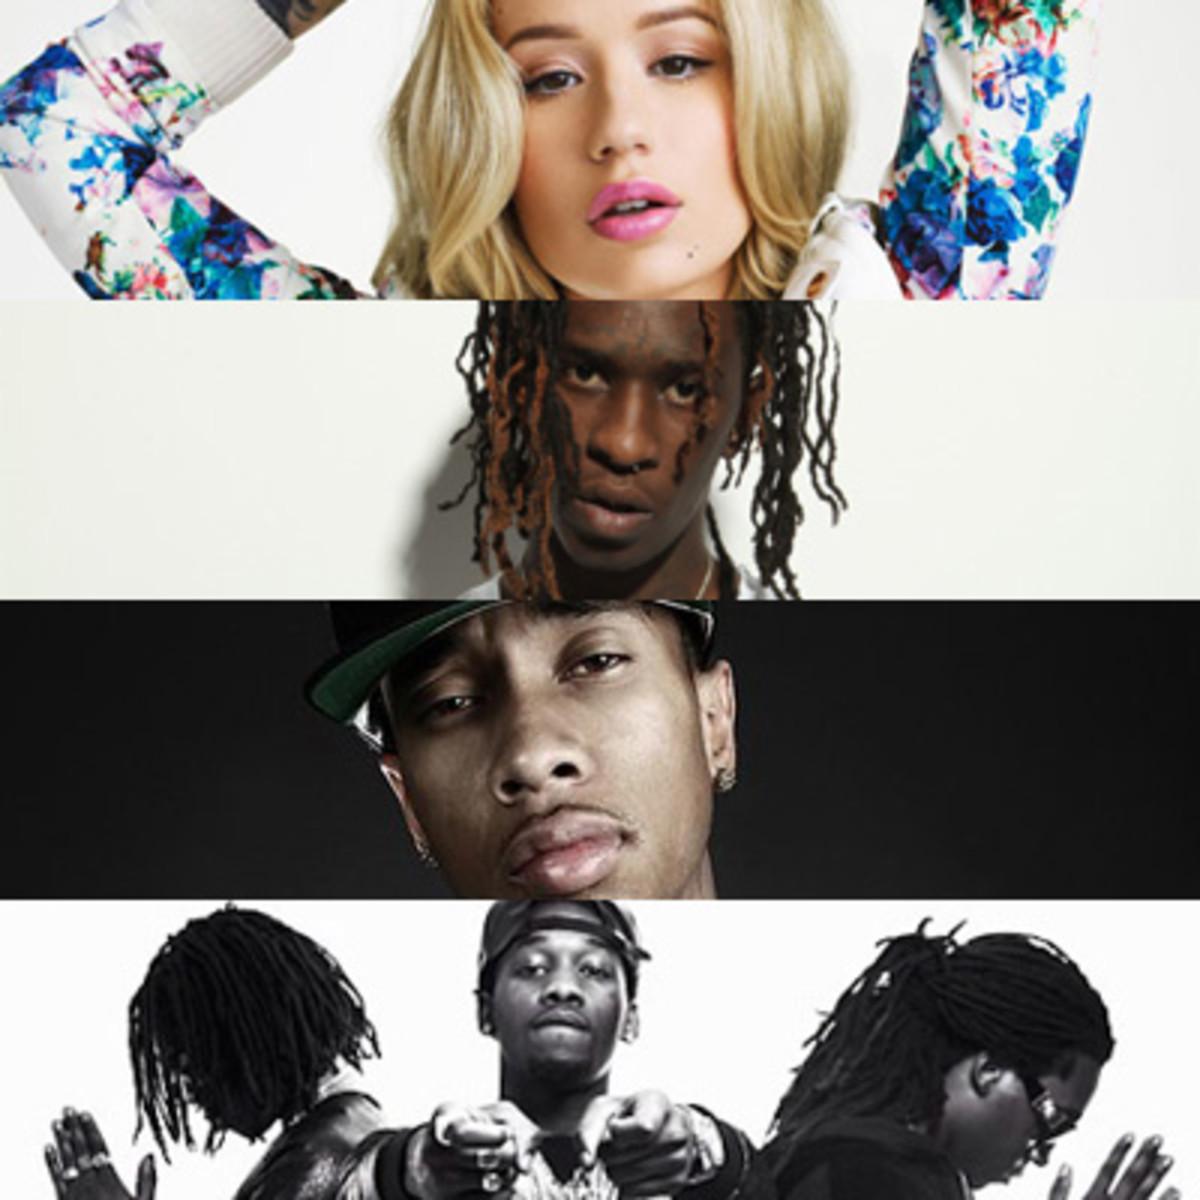 worst-rapper-2014.jpg